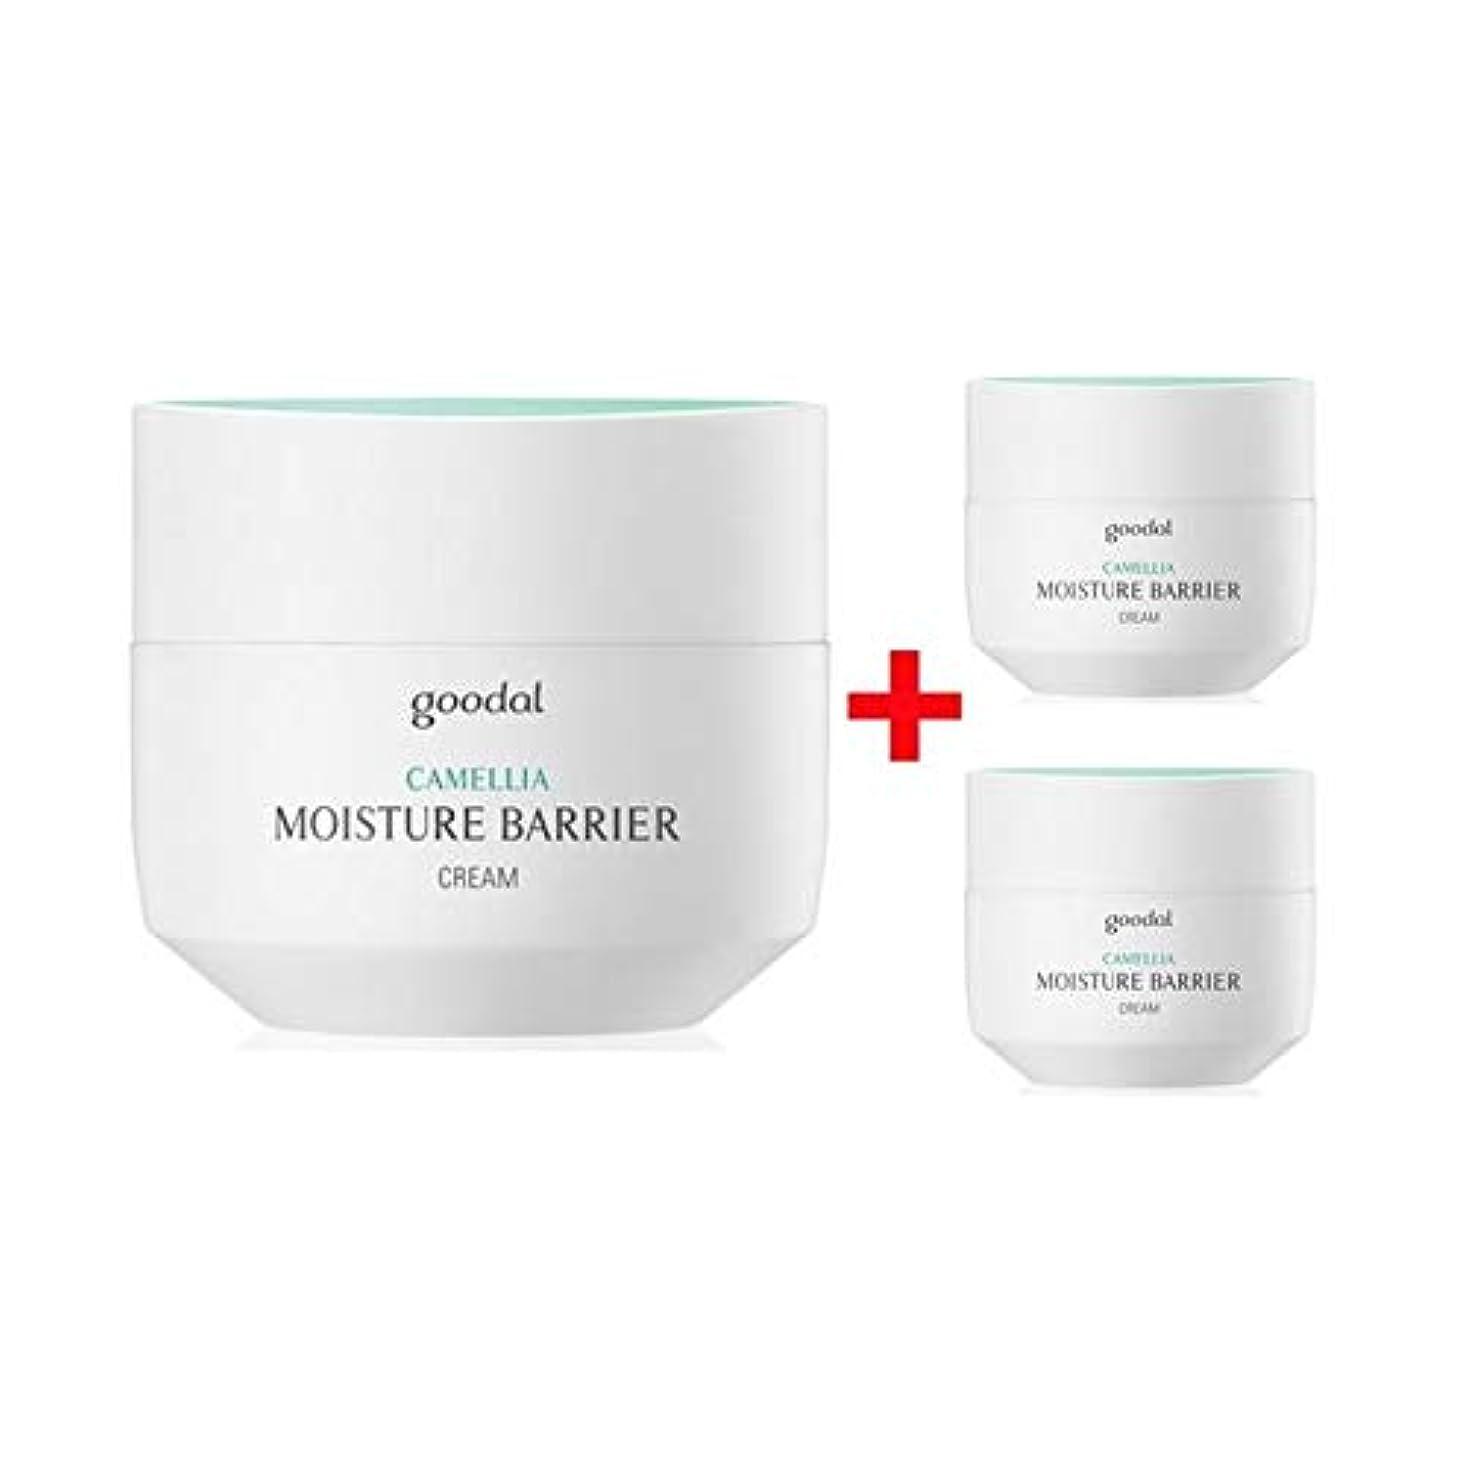 [ 50ml+10ml+10ml] グーダル カメリア モイスチャー バリア クリーム スペシャル セット Goodal Camellia Moisture Barrier Cream Special Set [並行輸入品]